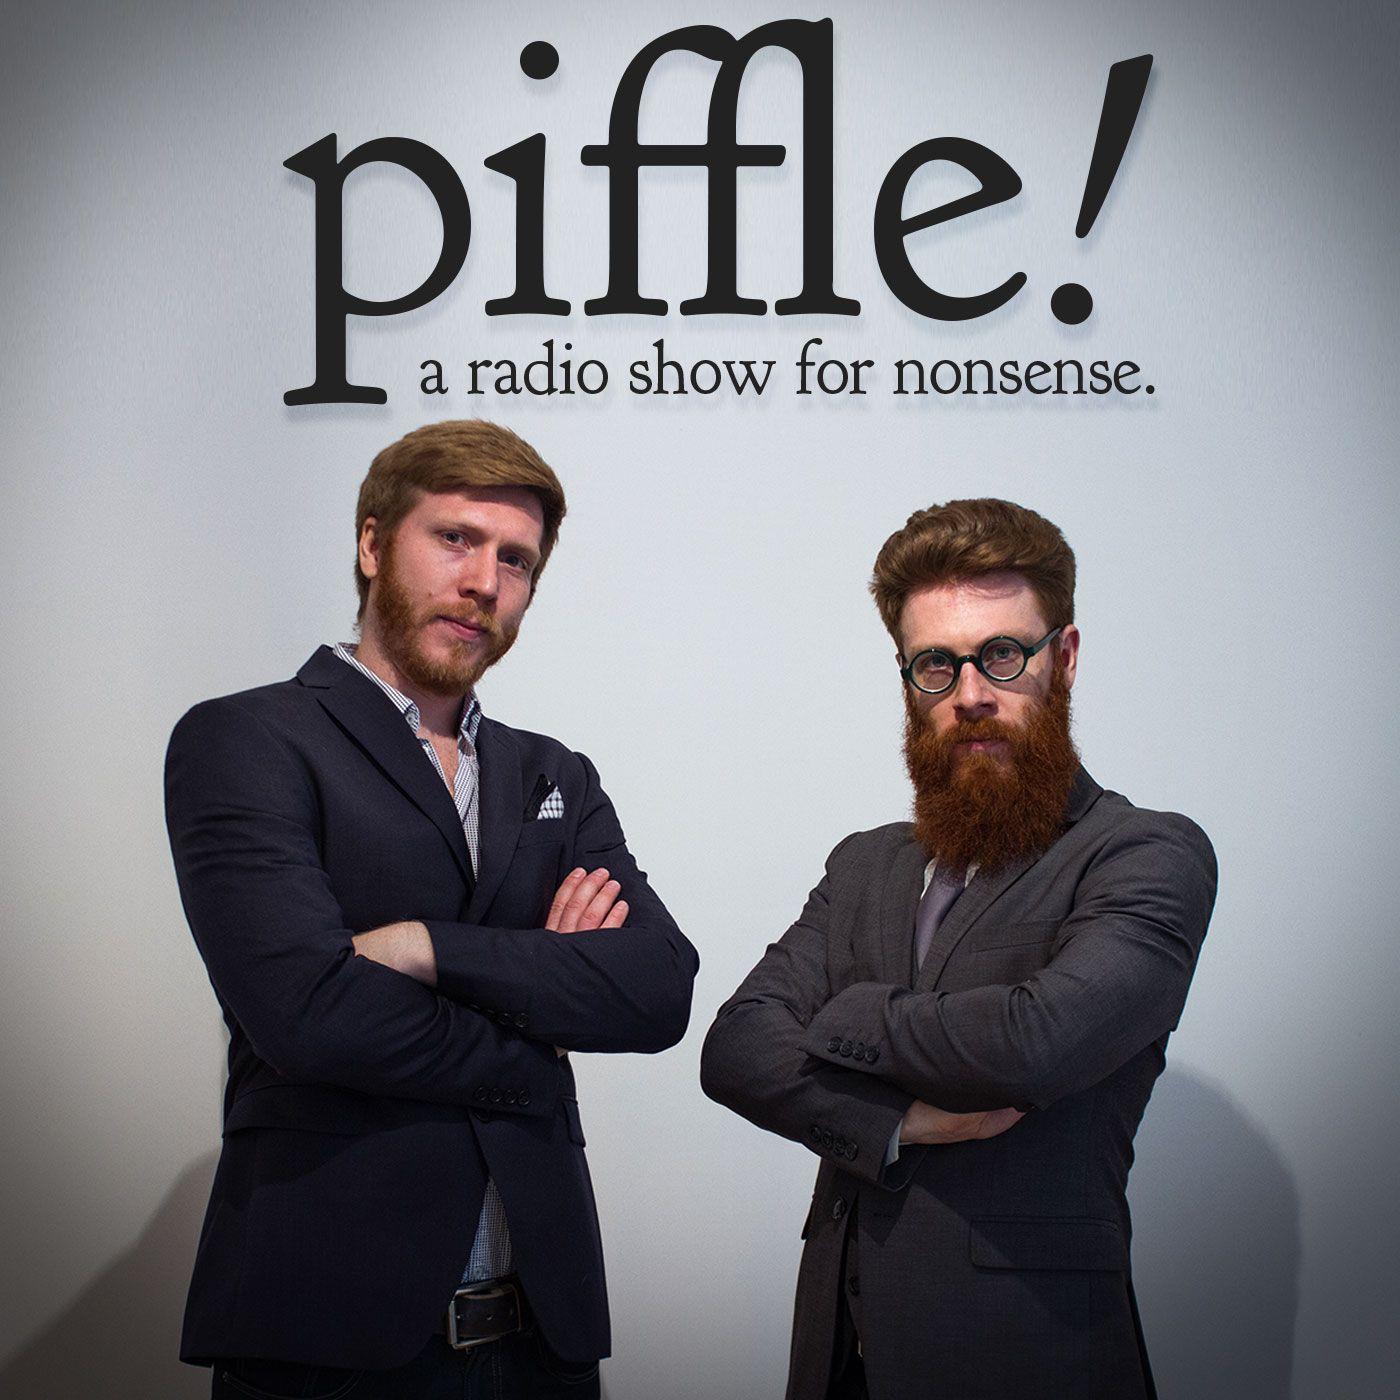 piffle! radio